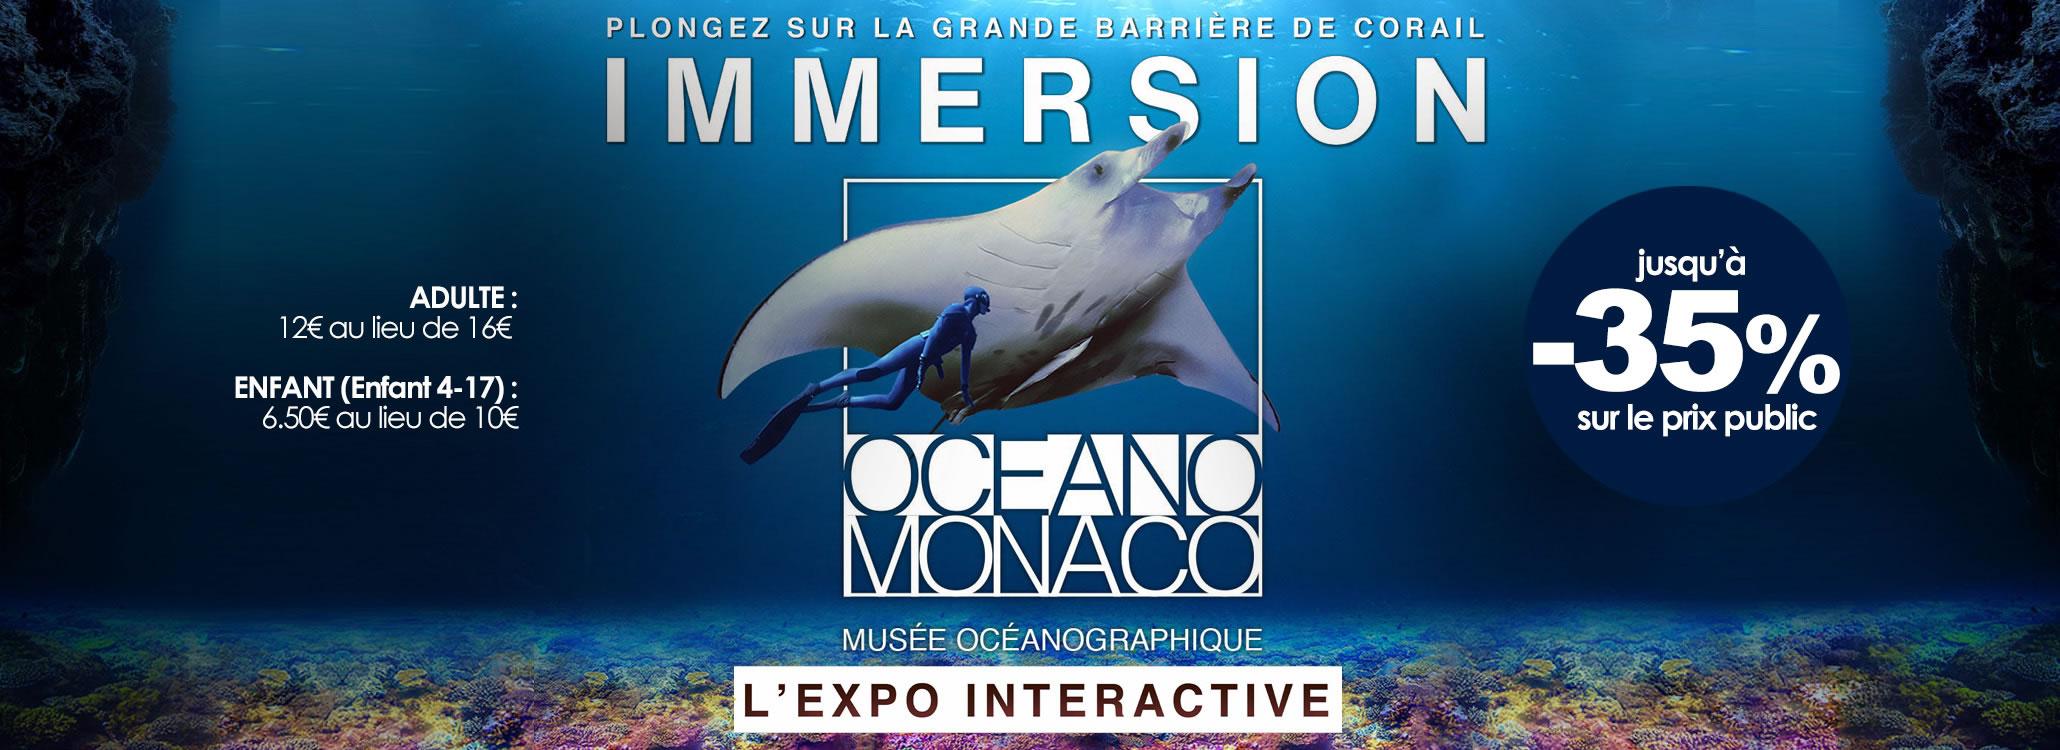 MUSEE-OCEANOGRAPHIQUE-MONACO-210821